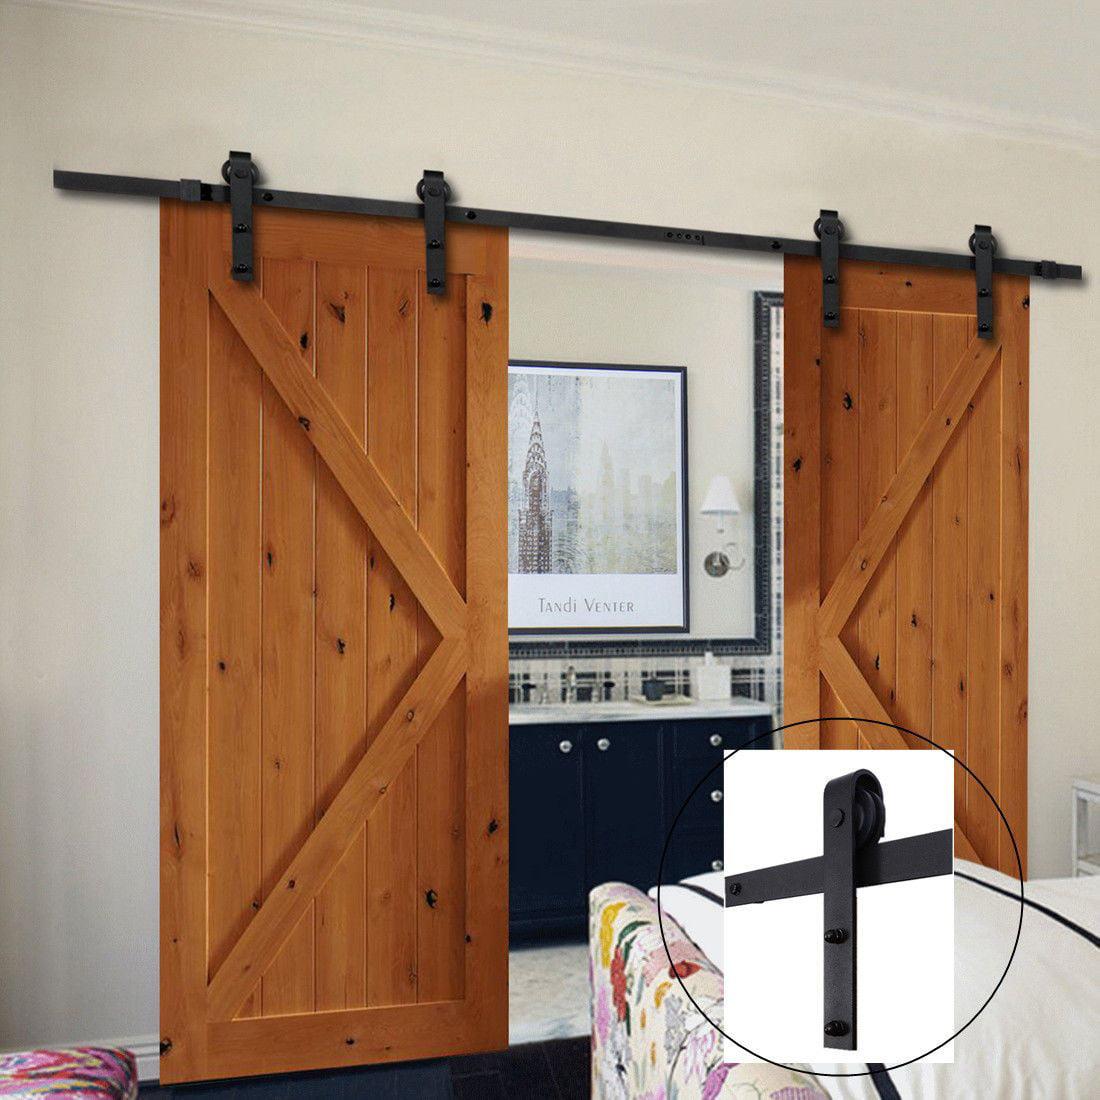 13 FT Sliding Barn Door Hardware Track System Kit Double Door Wall Mount Guide